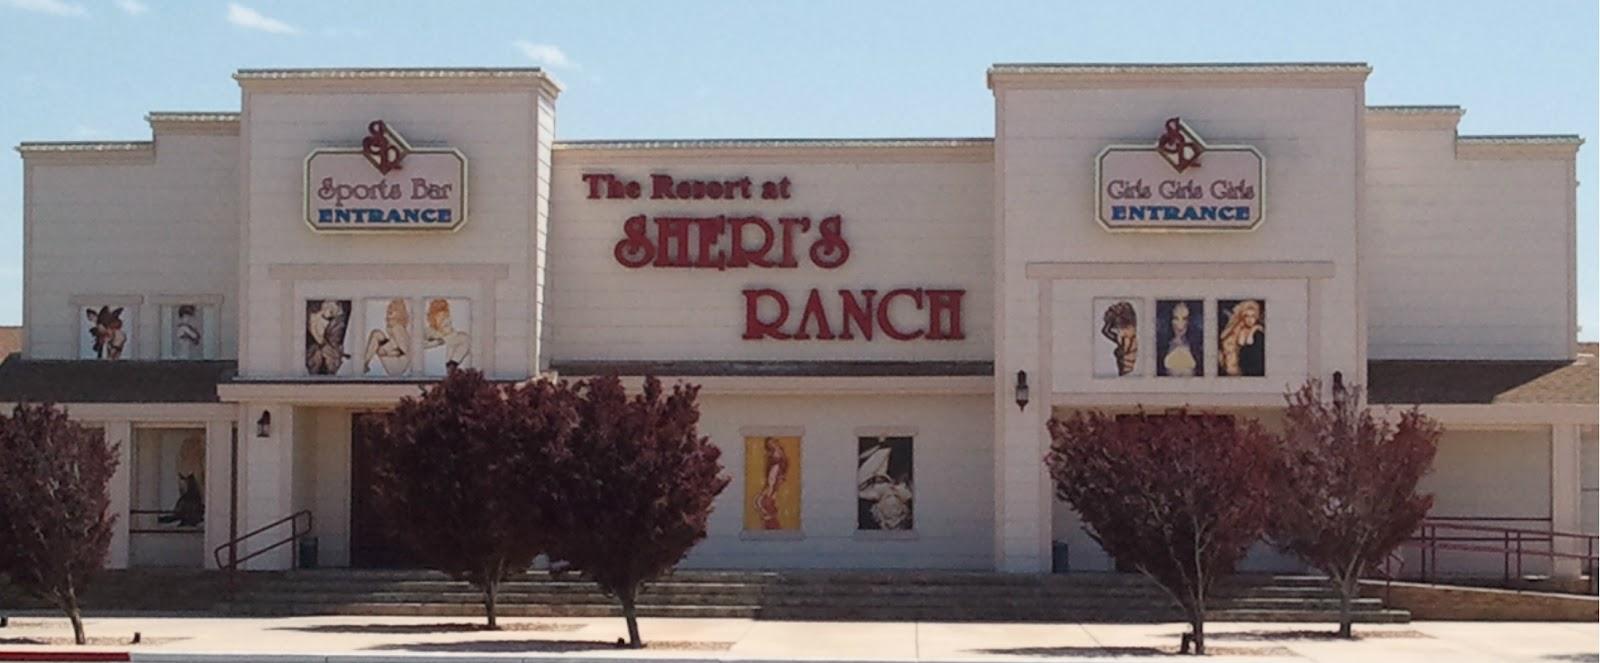 Sheris Ranch Pahrump